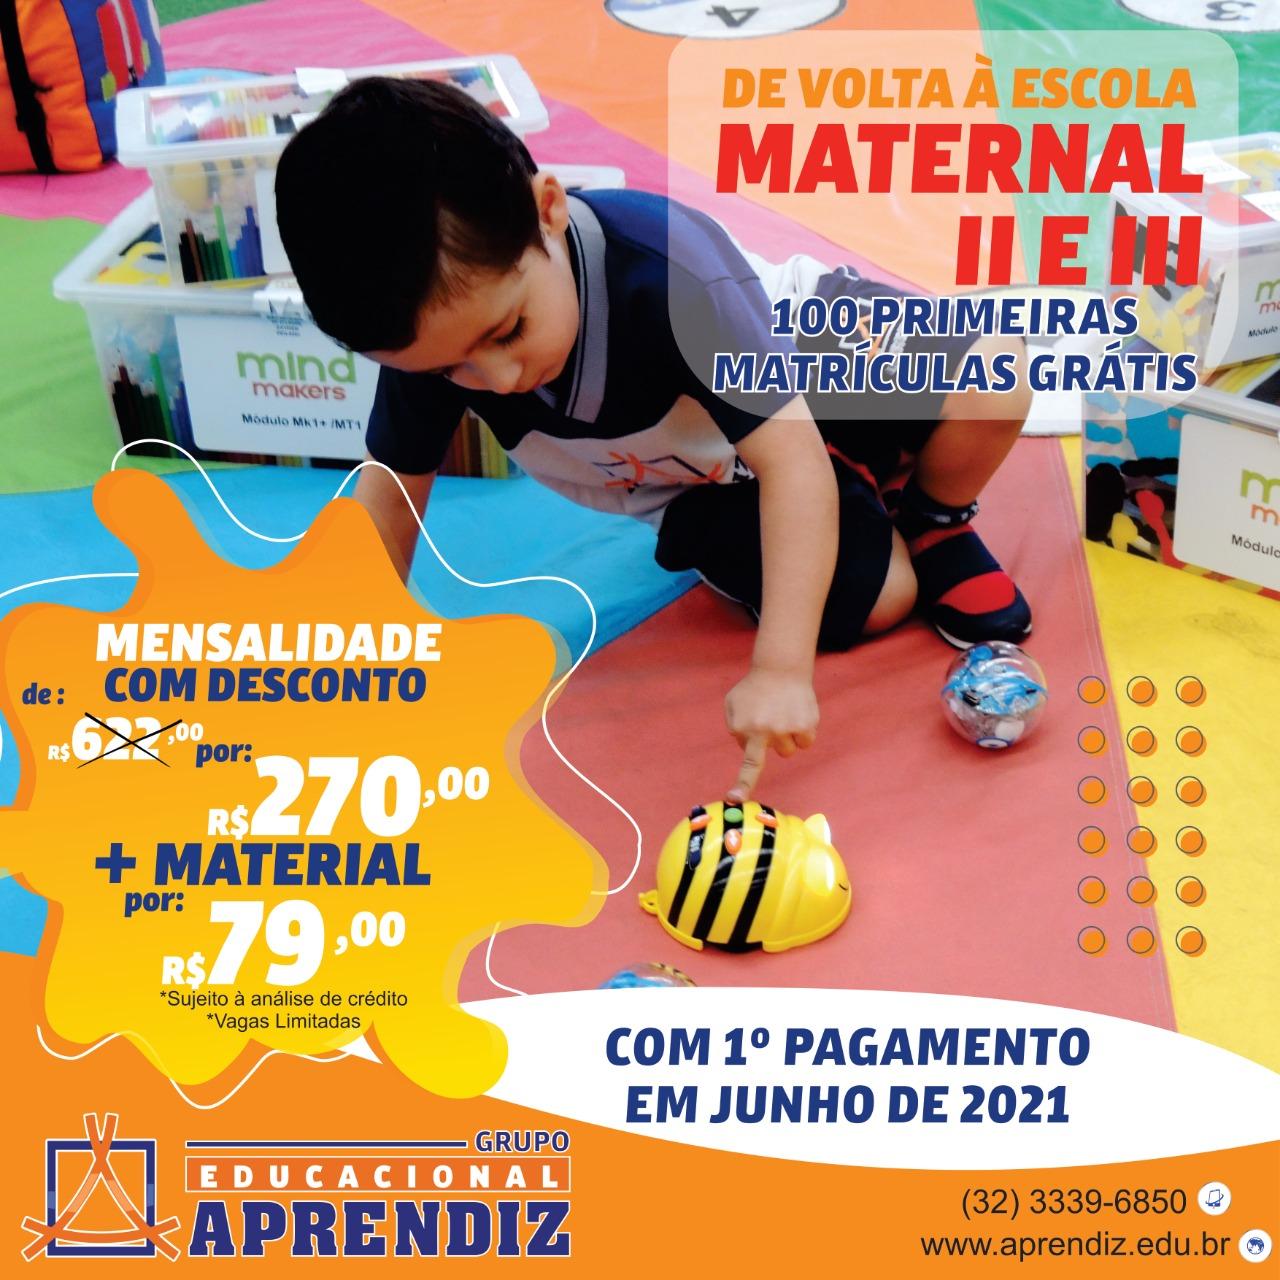 Aprendiz Maternal II e III